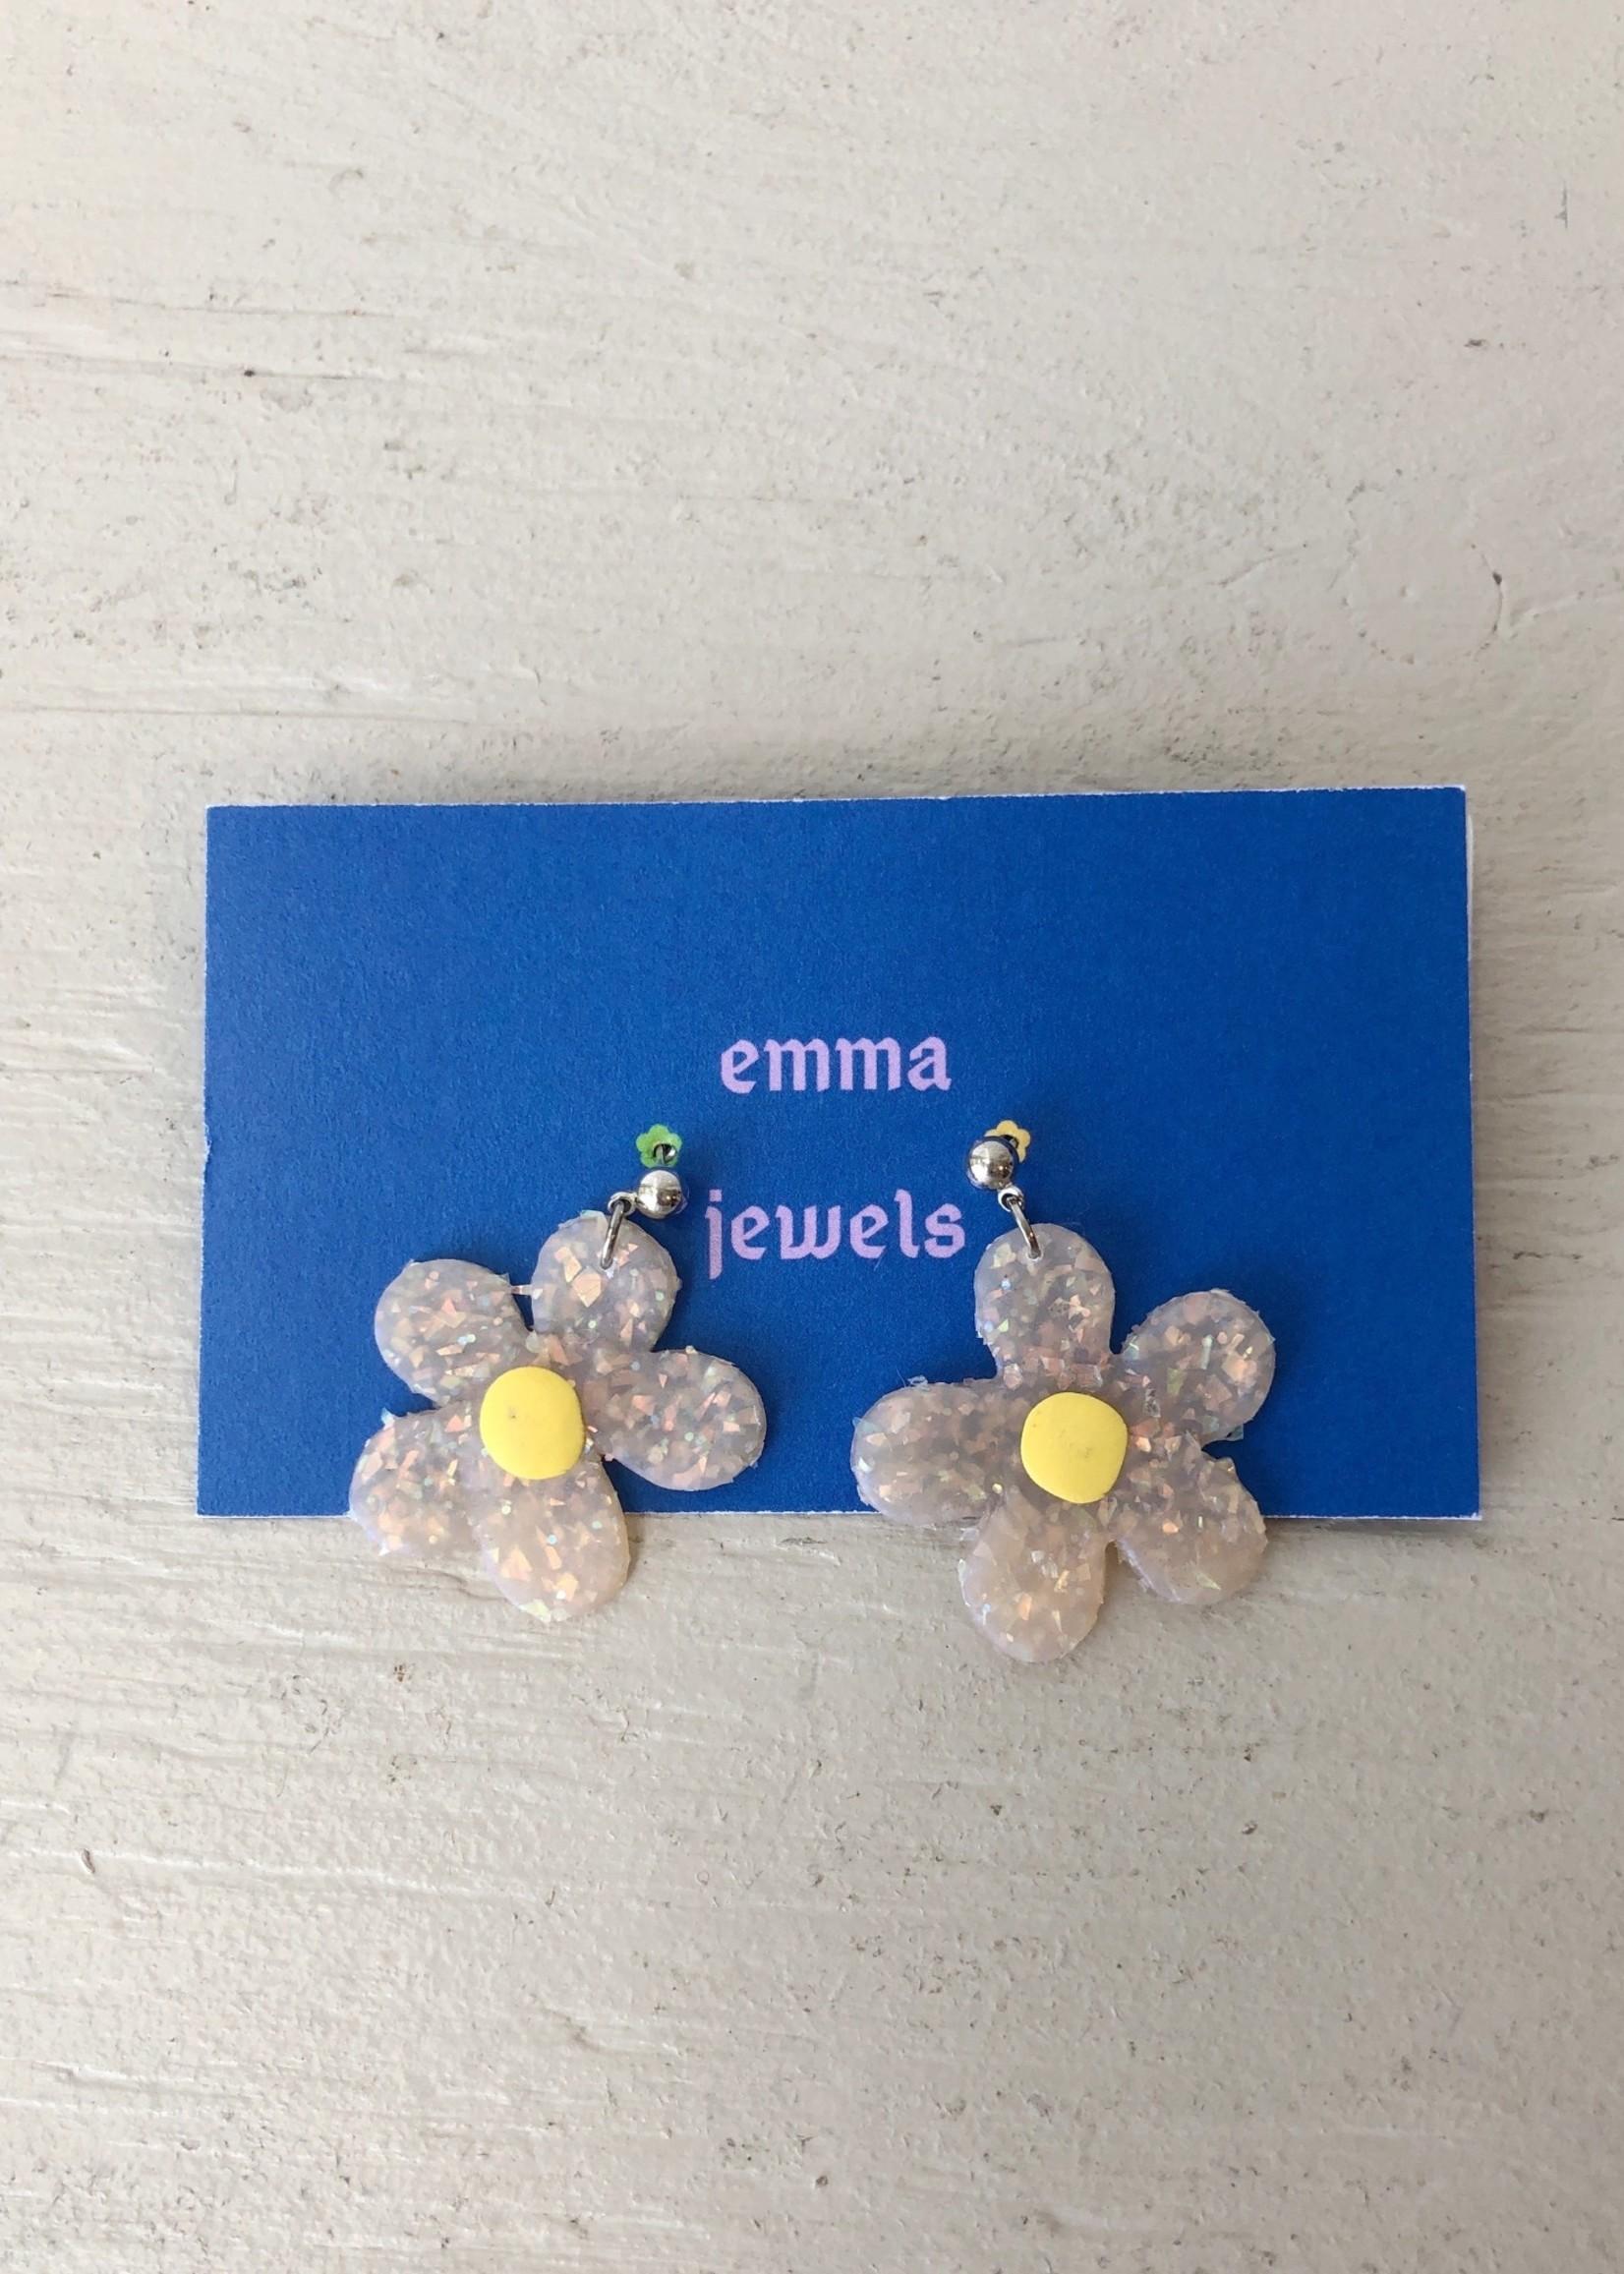 Emma Jewels Opal Daisies Earrings by Emma Jewels